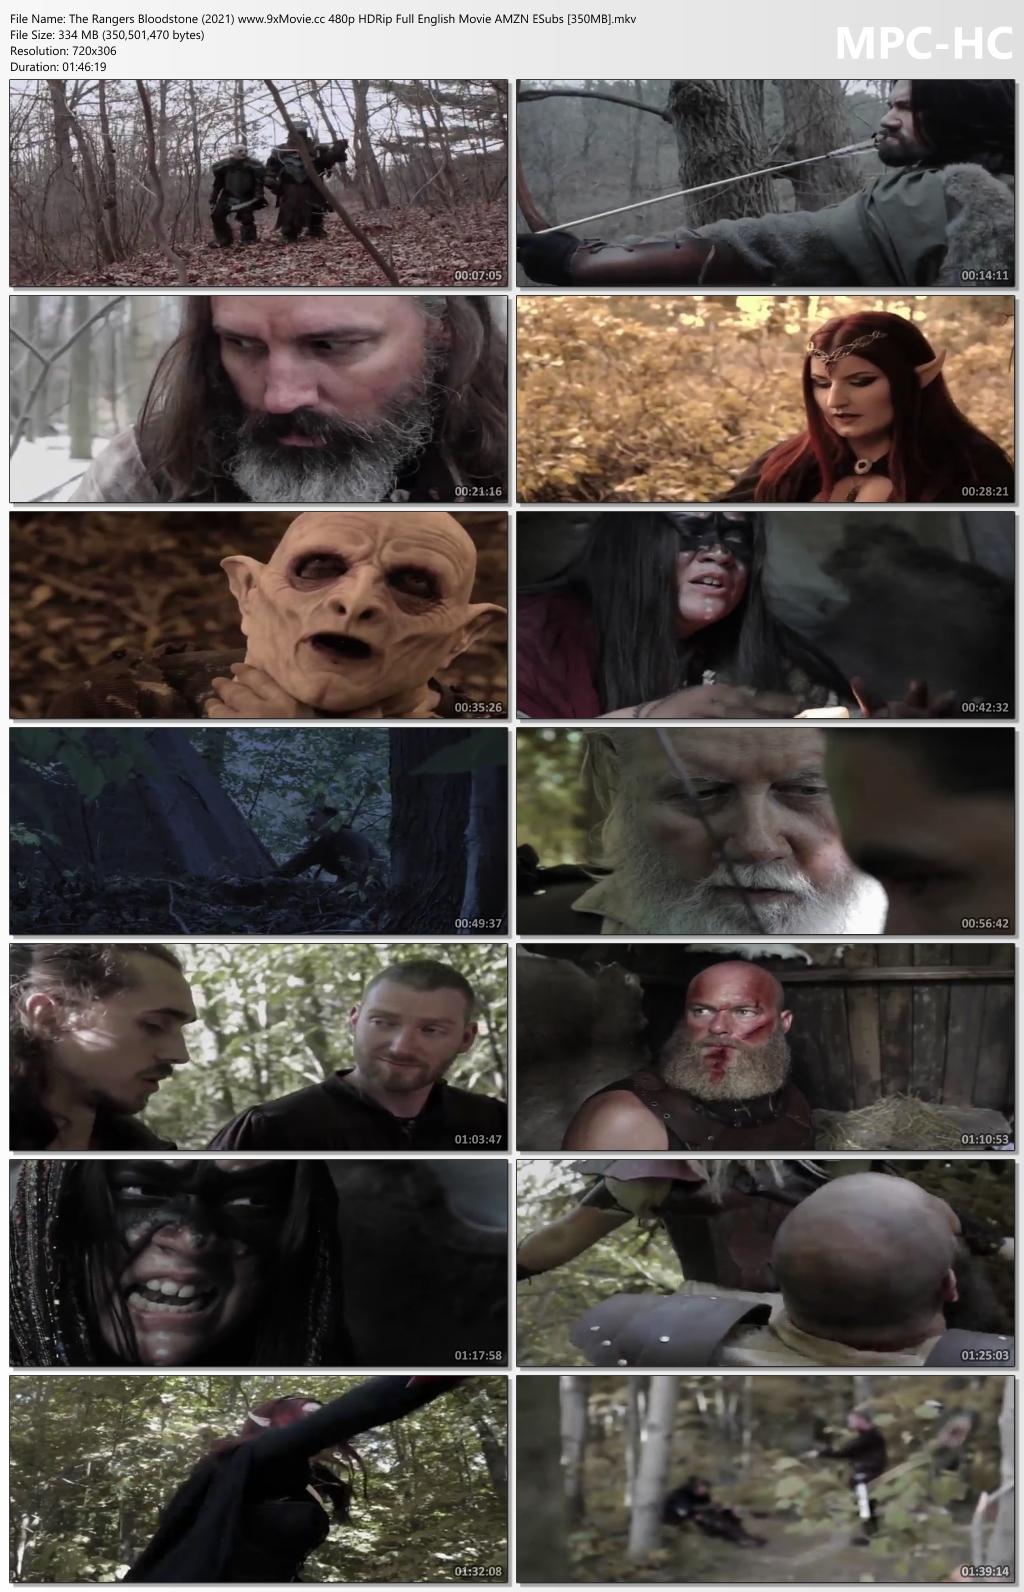 The-Rangers-Bloodstone-2021-www-9x-Movie-cc-480p-HDRip-Full-English-Movie-AMZN-ESubs-350-MB-mkv